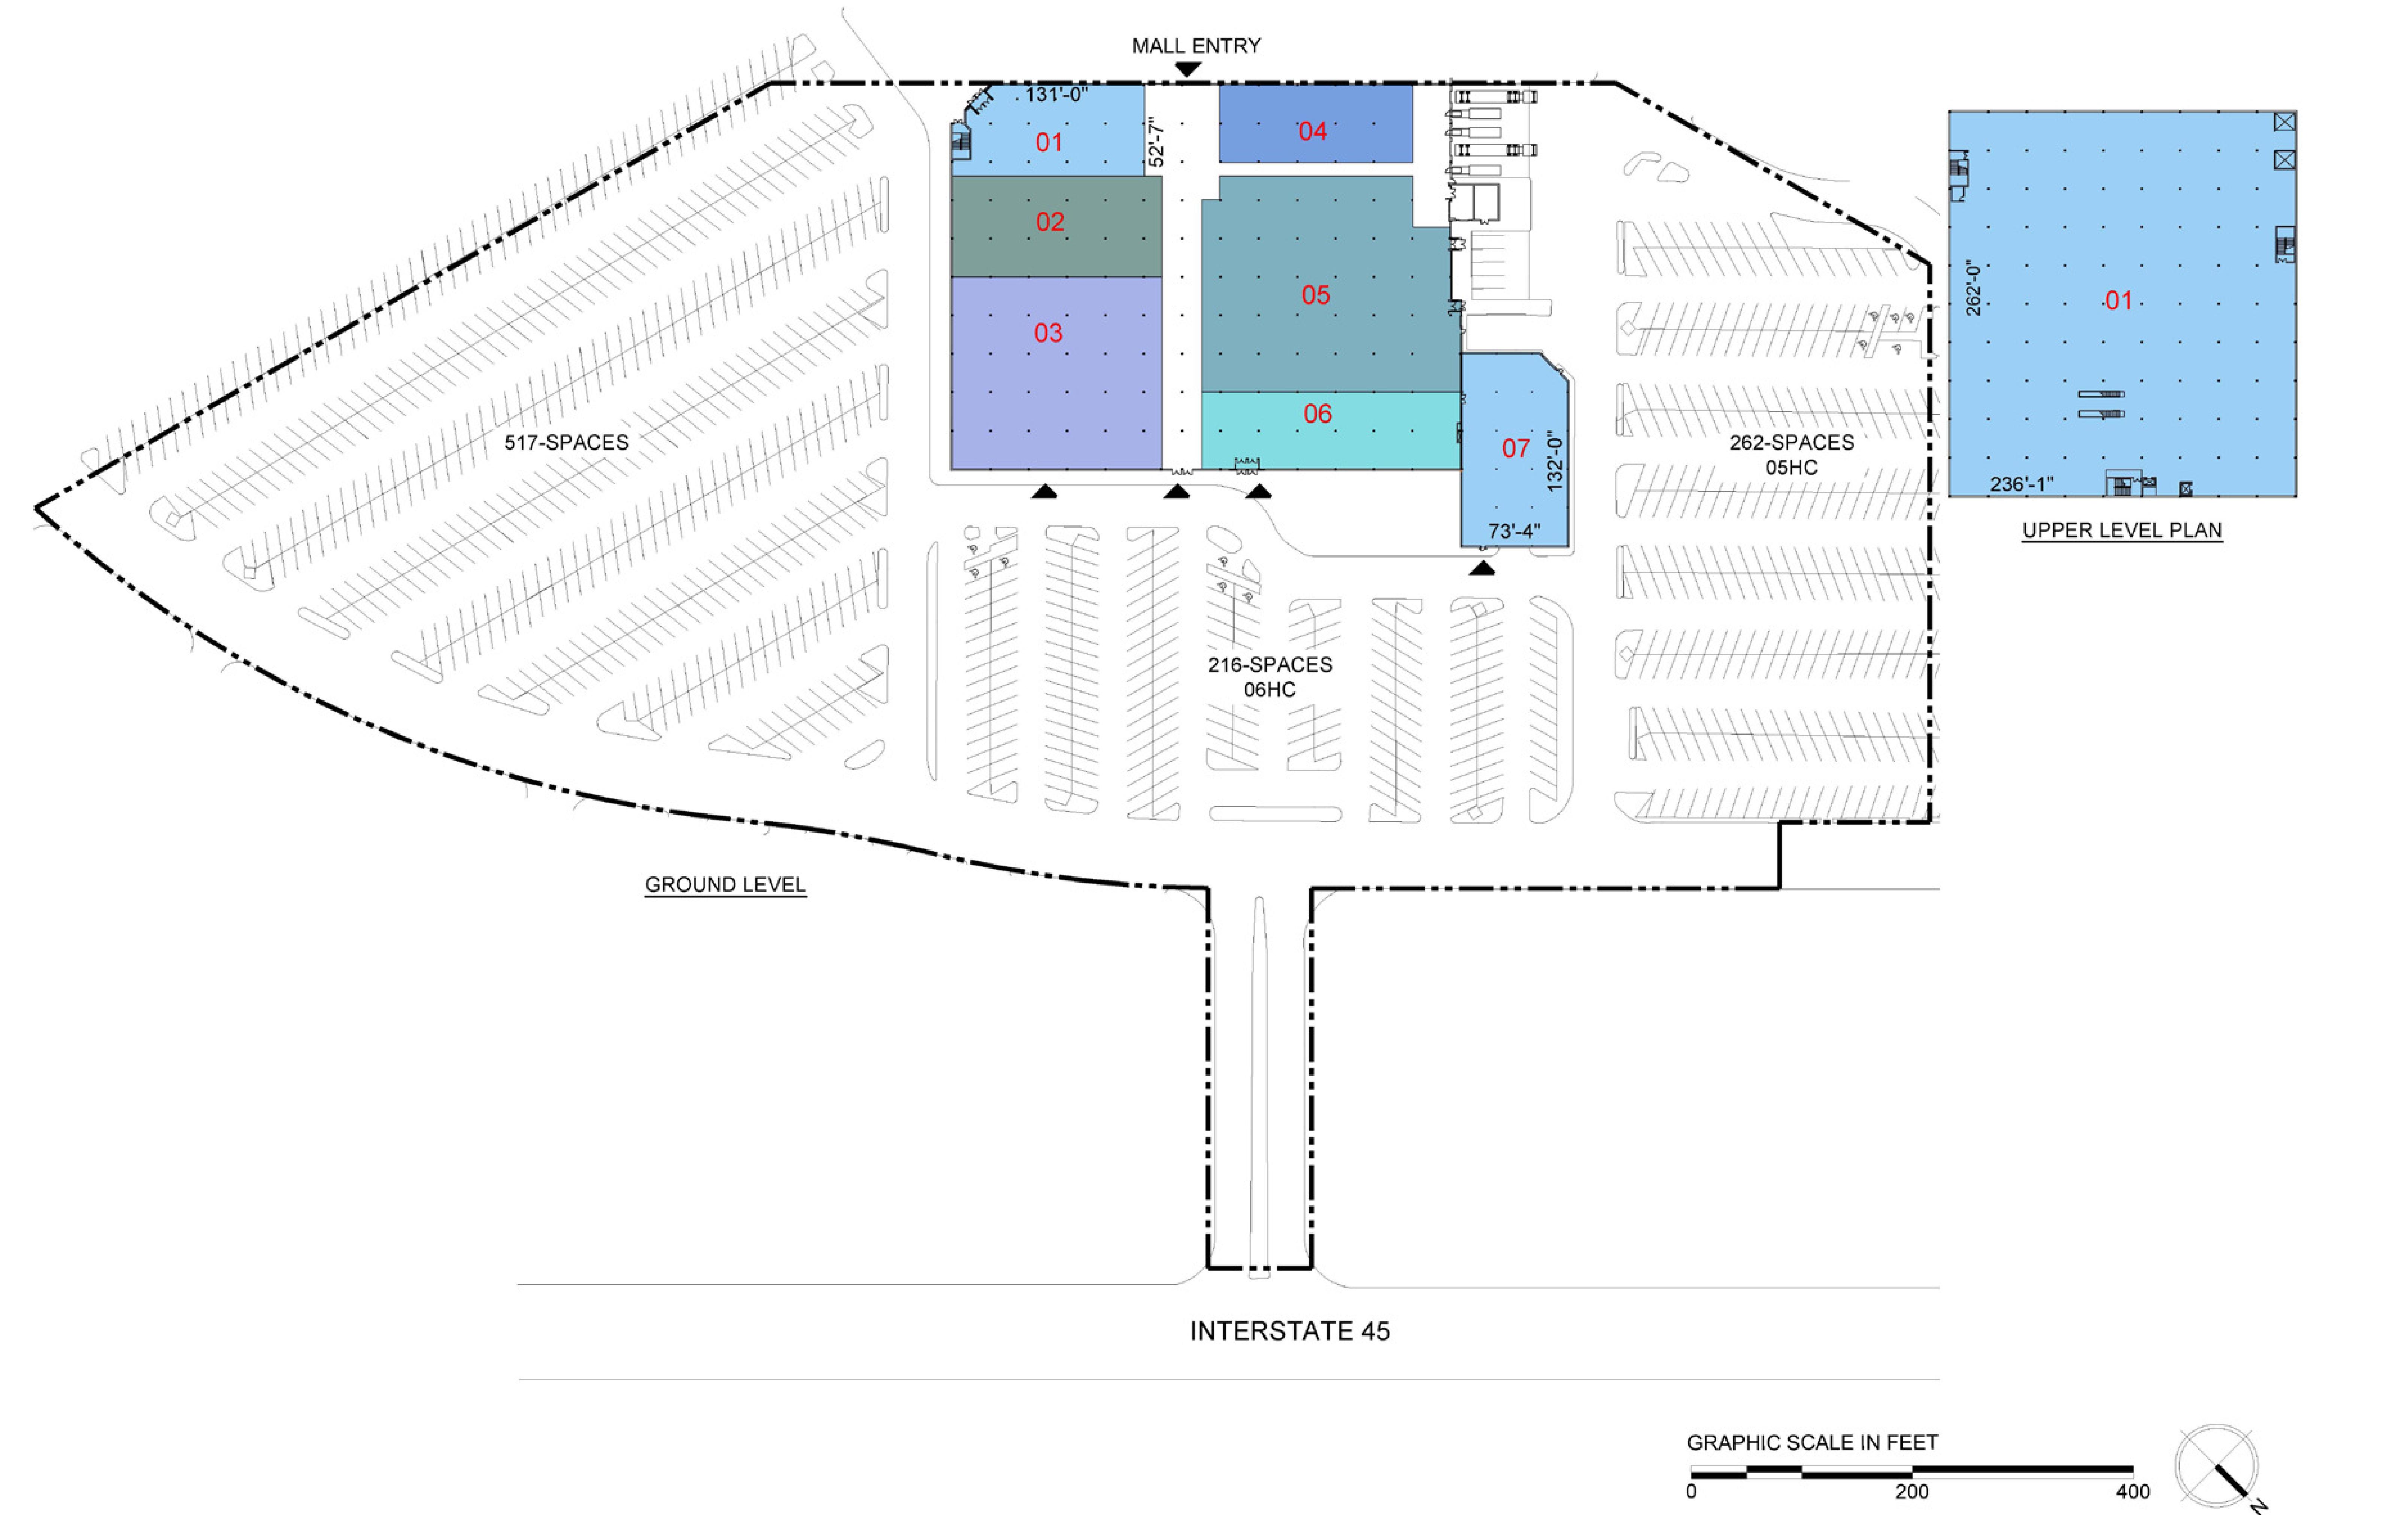 Baybrook Mall: site plan